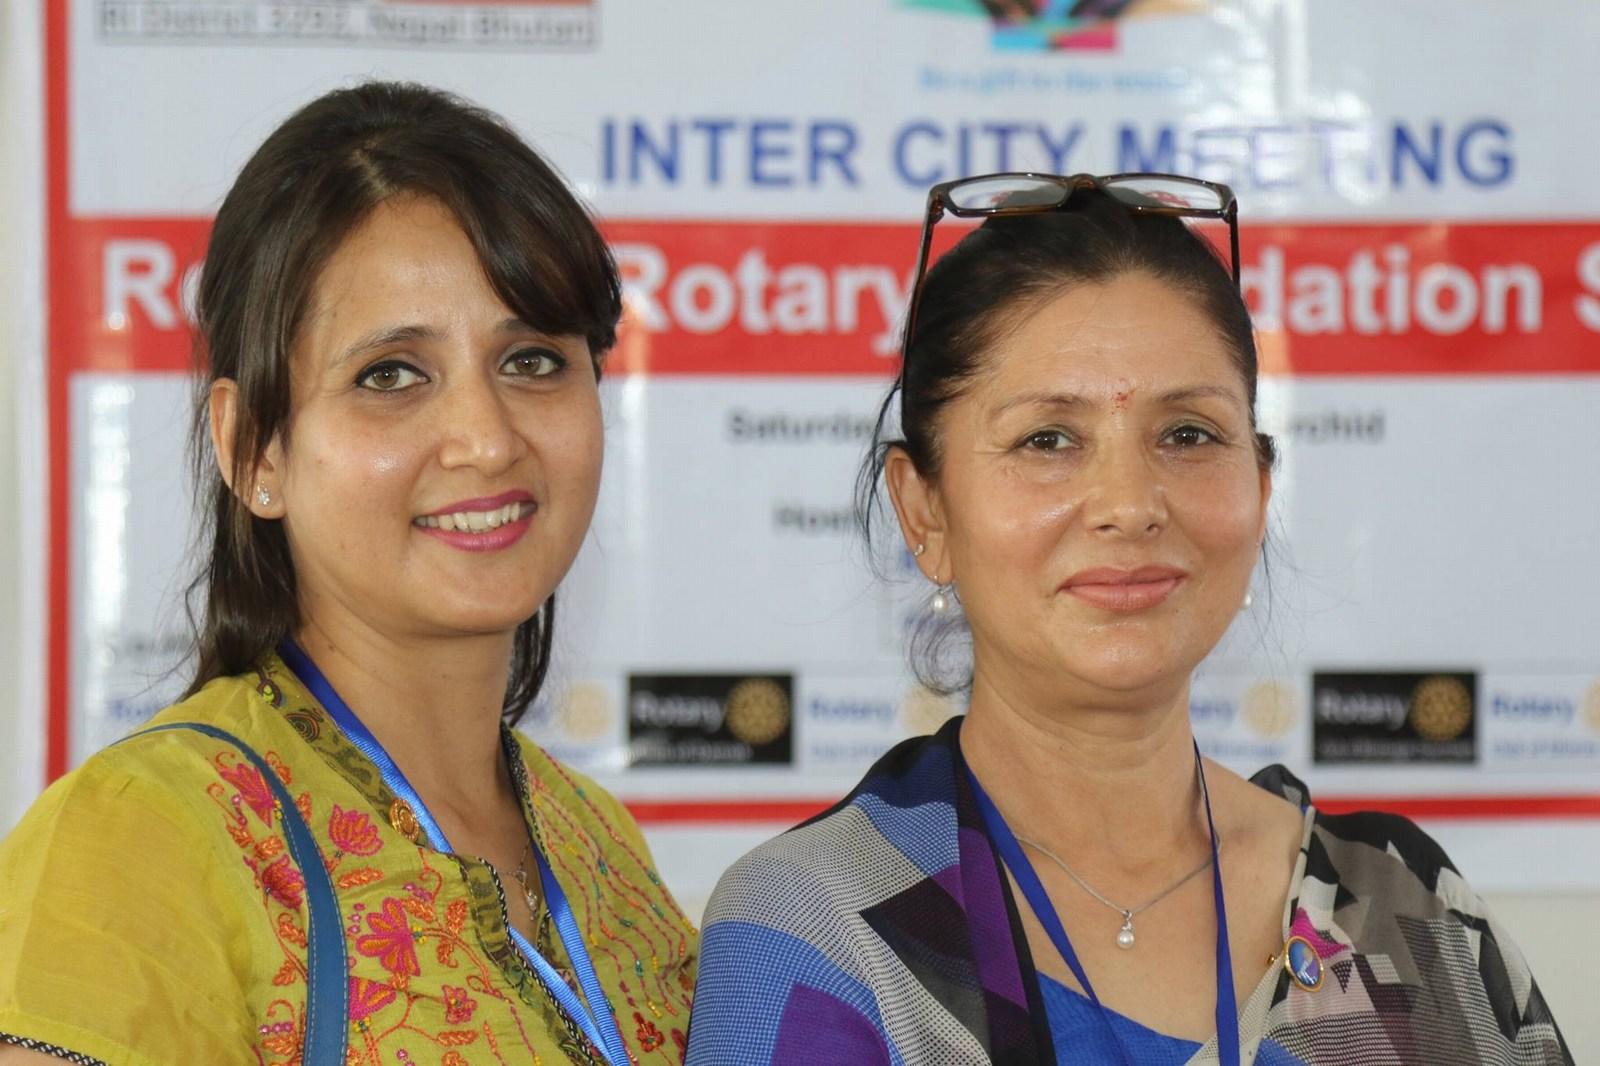 Regional-Rotary-Foundation-Seminar-Intercity-Meeting-Rotary-Club-of-Kakarvitta-17